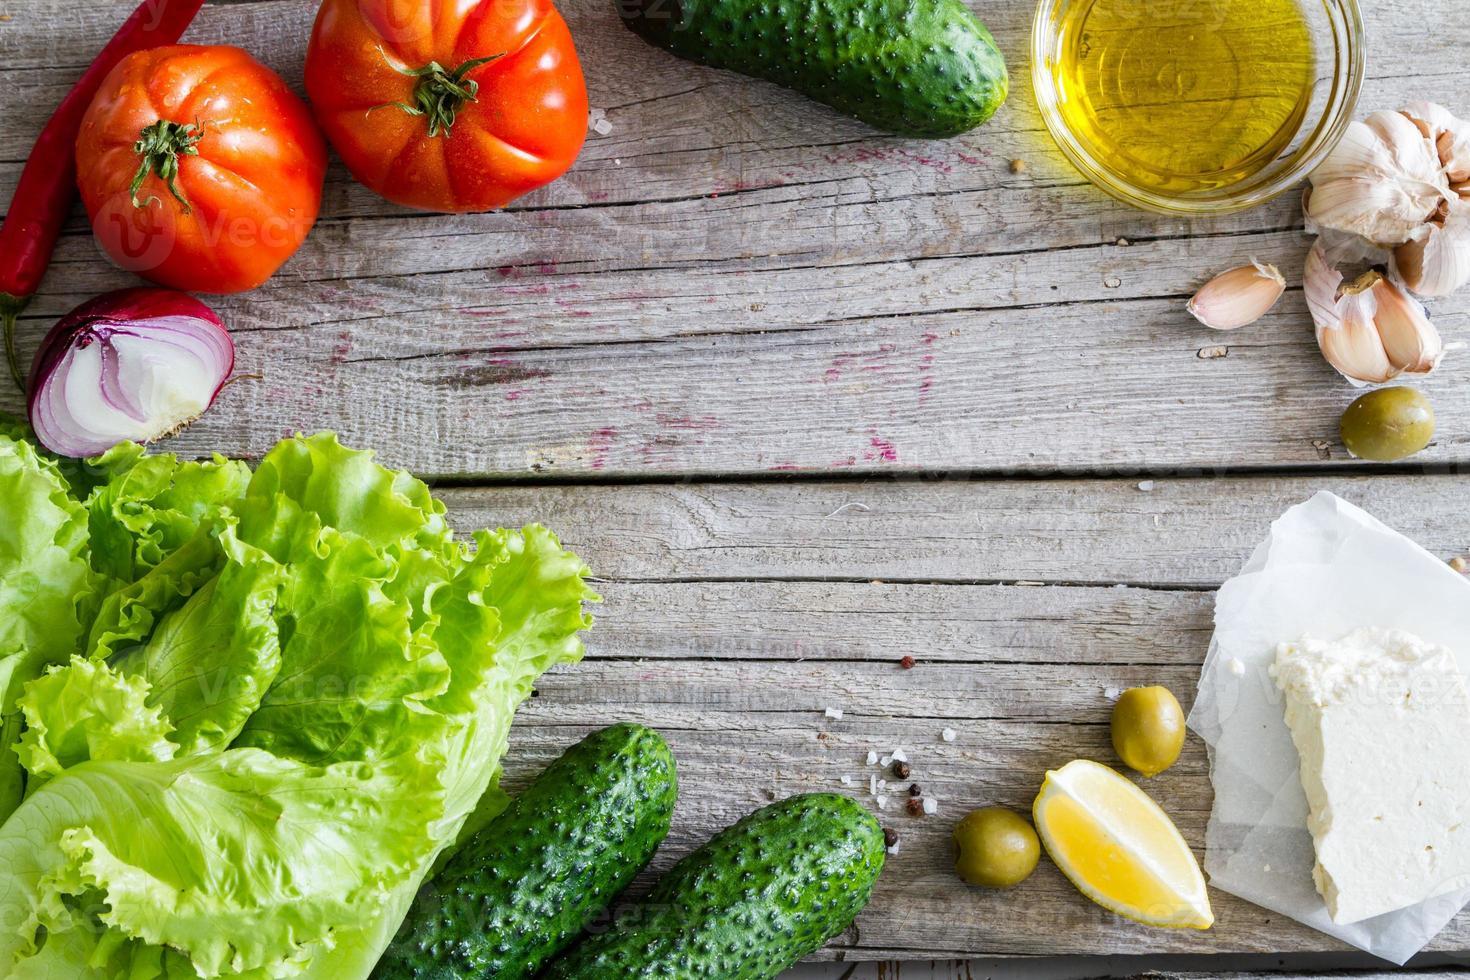 Griekse salade-ingrediënten - tomaat, komkommer, salade, ui foto